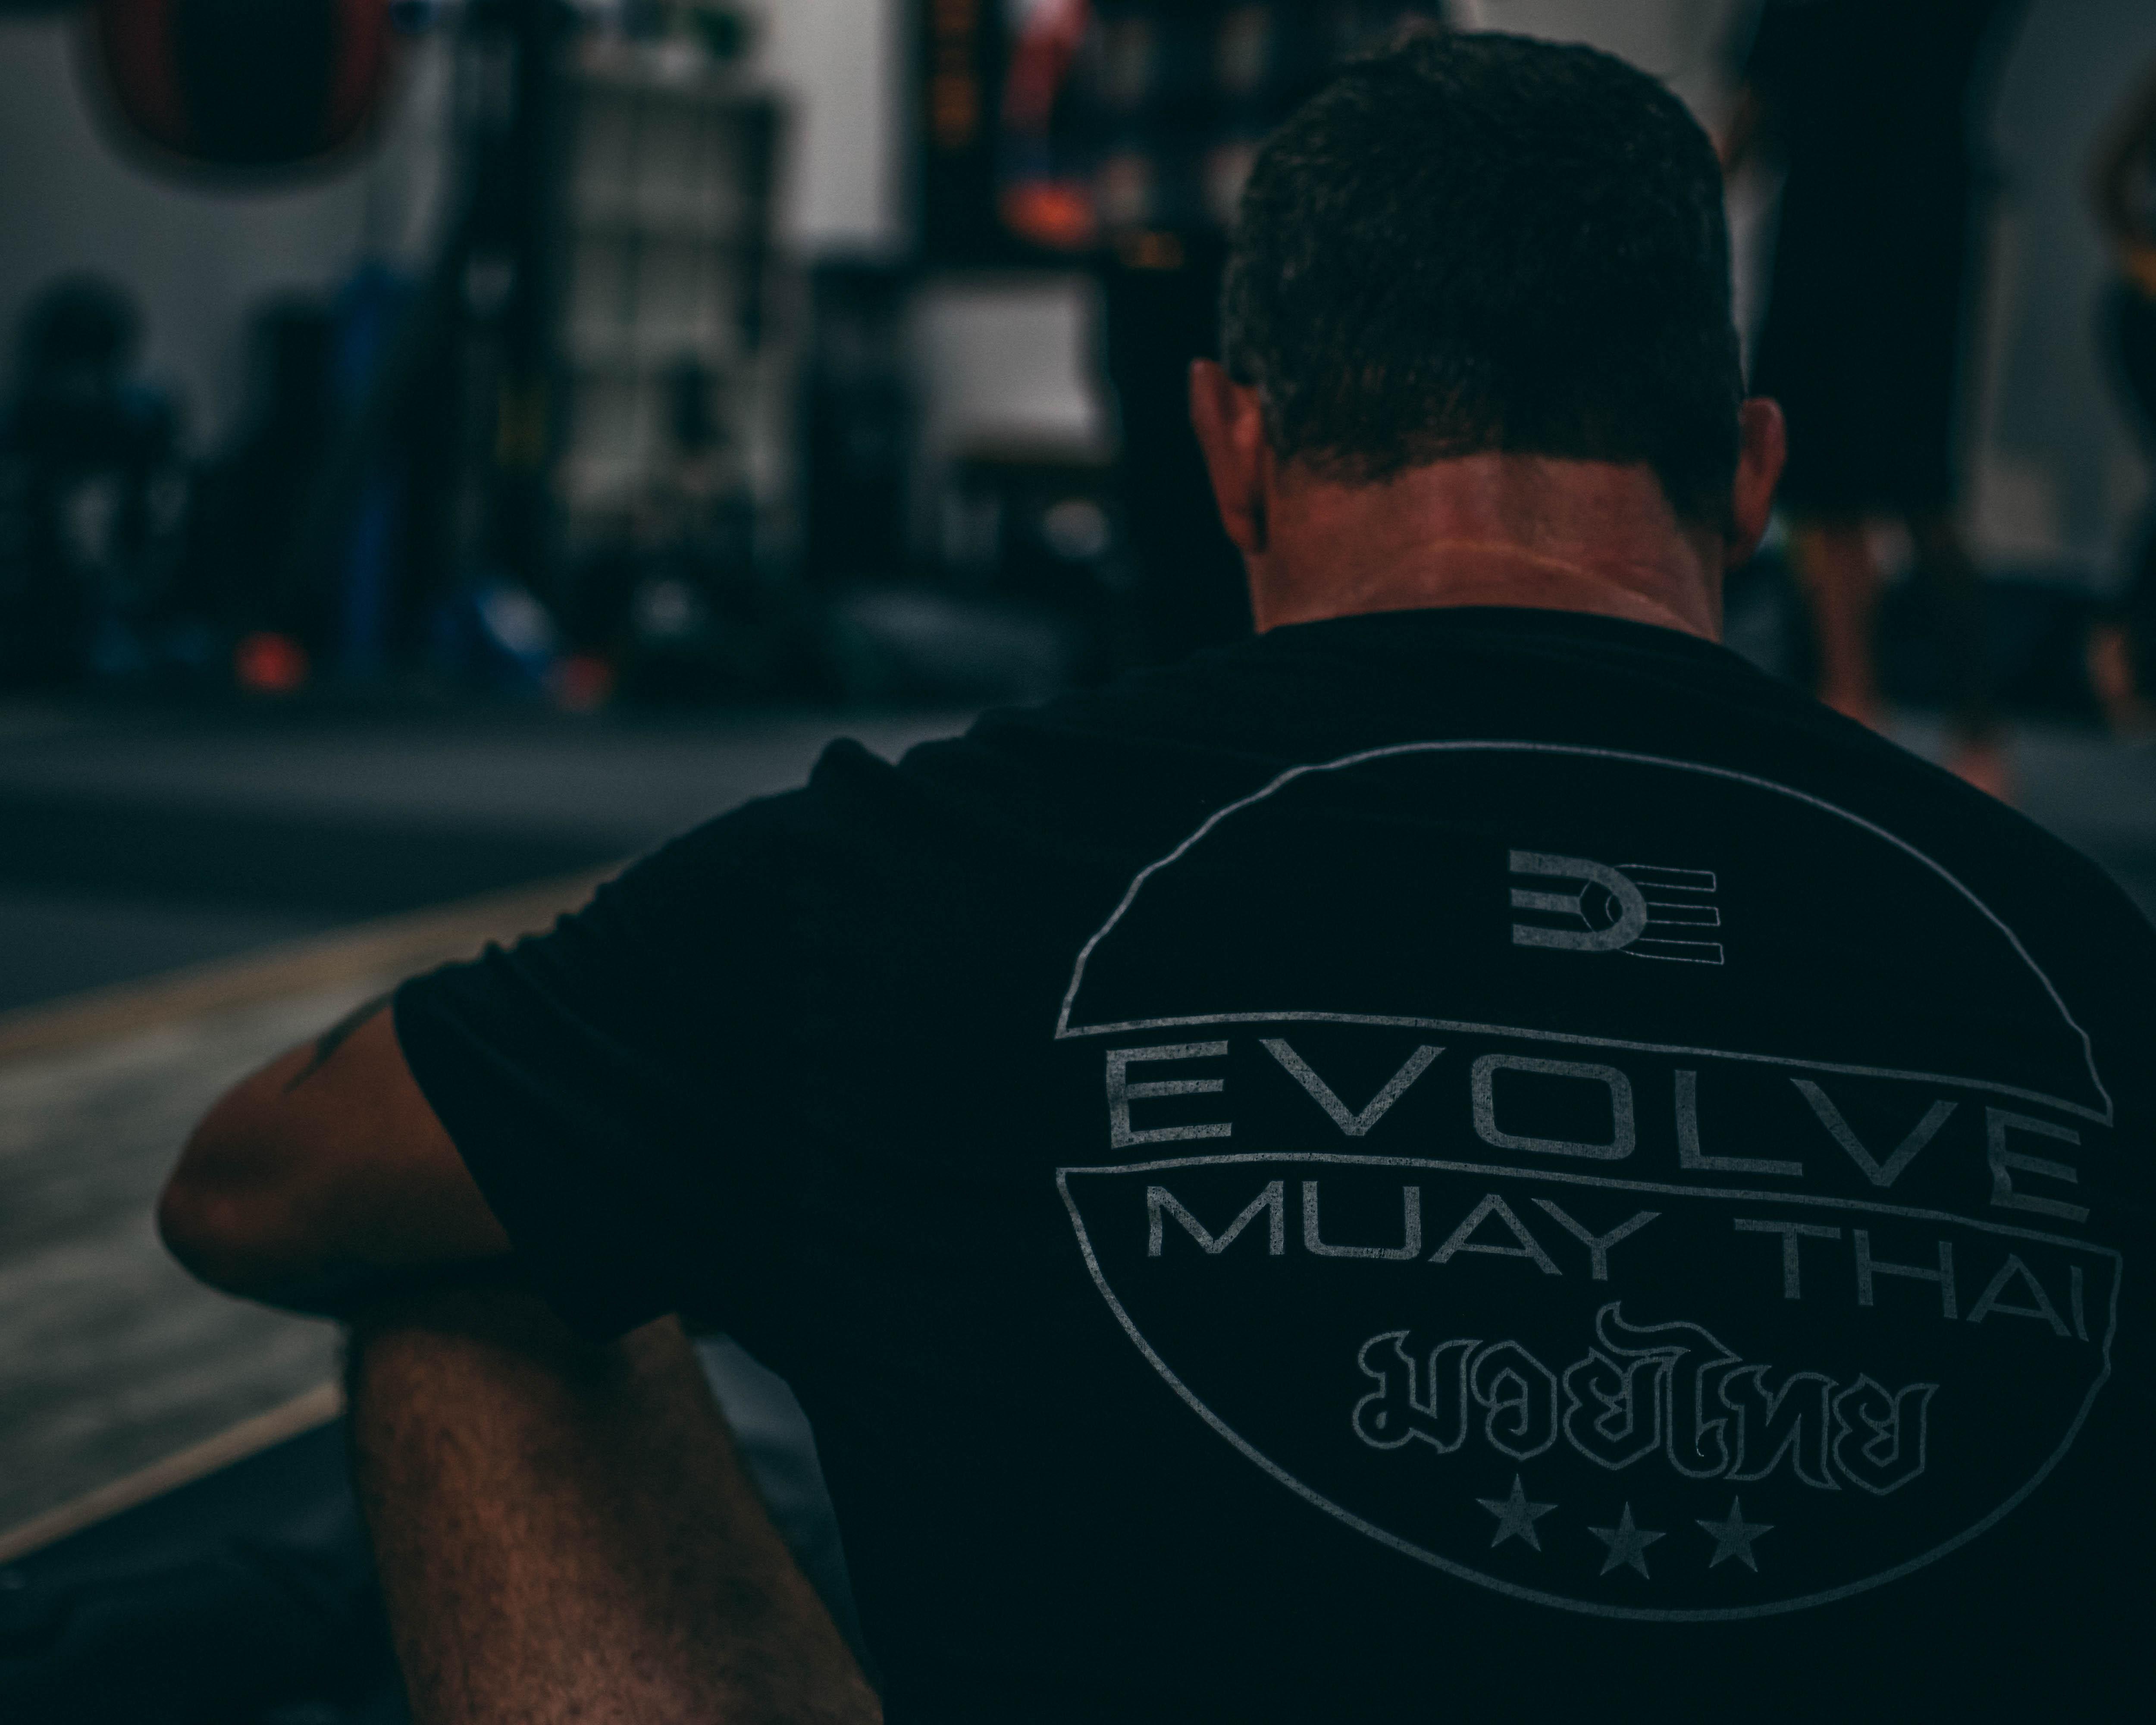 Evolve Checkmat Jiu Jitsu / Muay Thai Academy